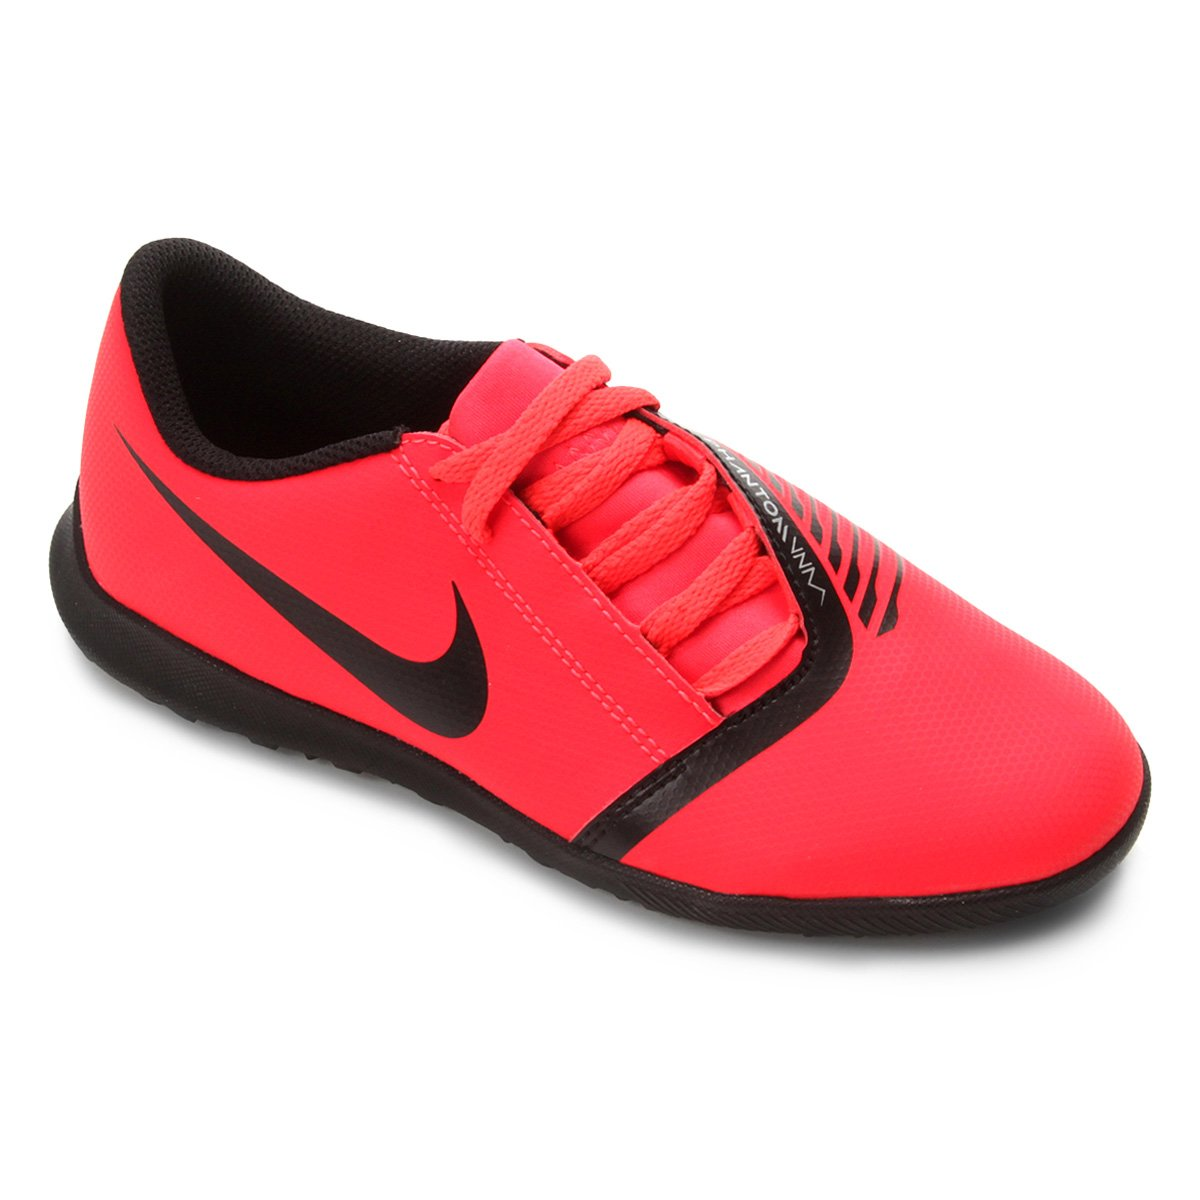 Chuteira Society Infantil Nike Phantom Venom Club TF - Vermelho e ... 3324ea72a2d74